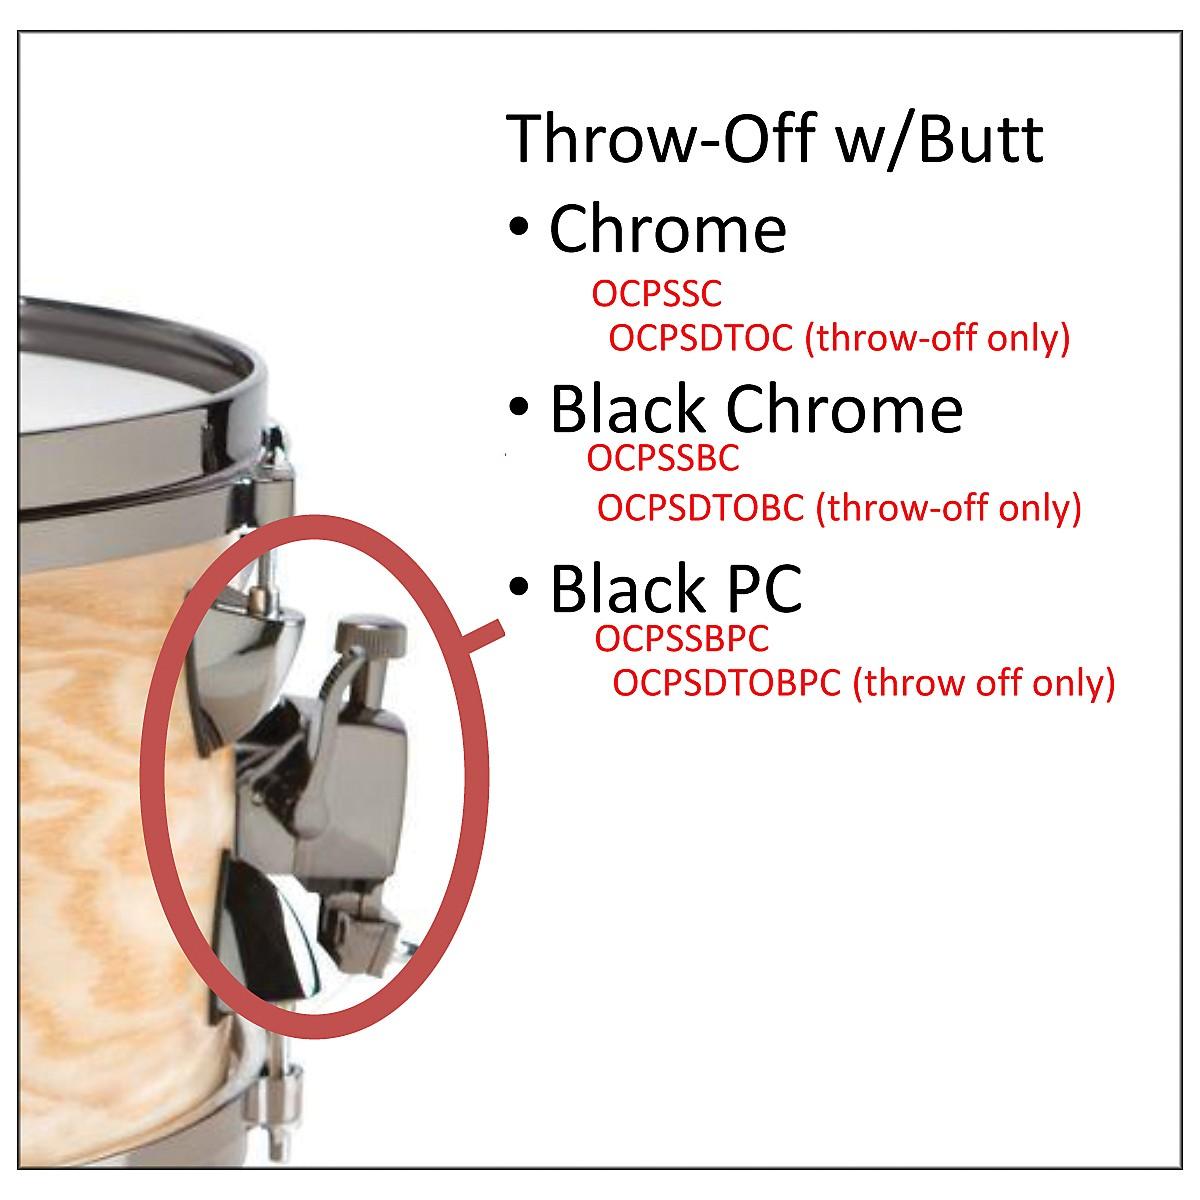 Orange County Drum & Percussion OCPSDTOBPC SNARE THROW OFF BLK PWD COAT